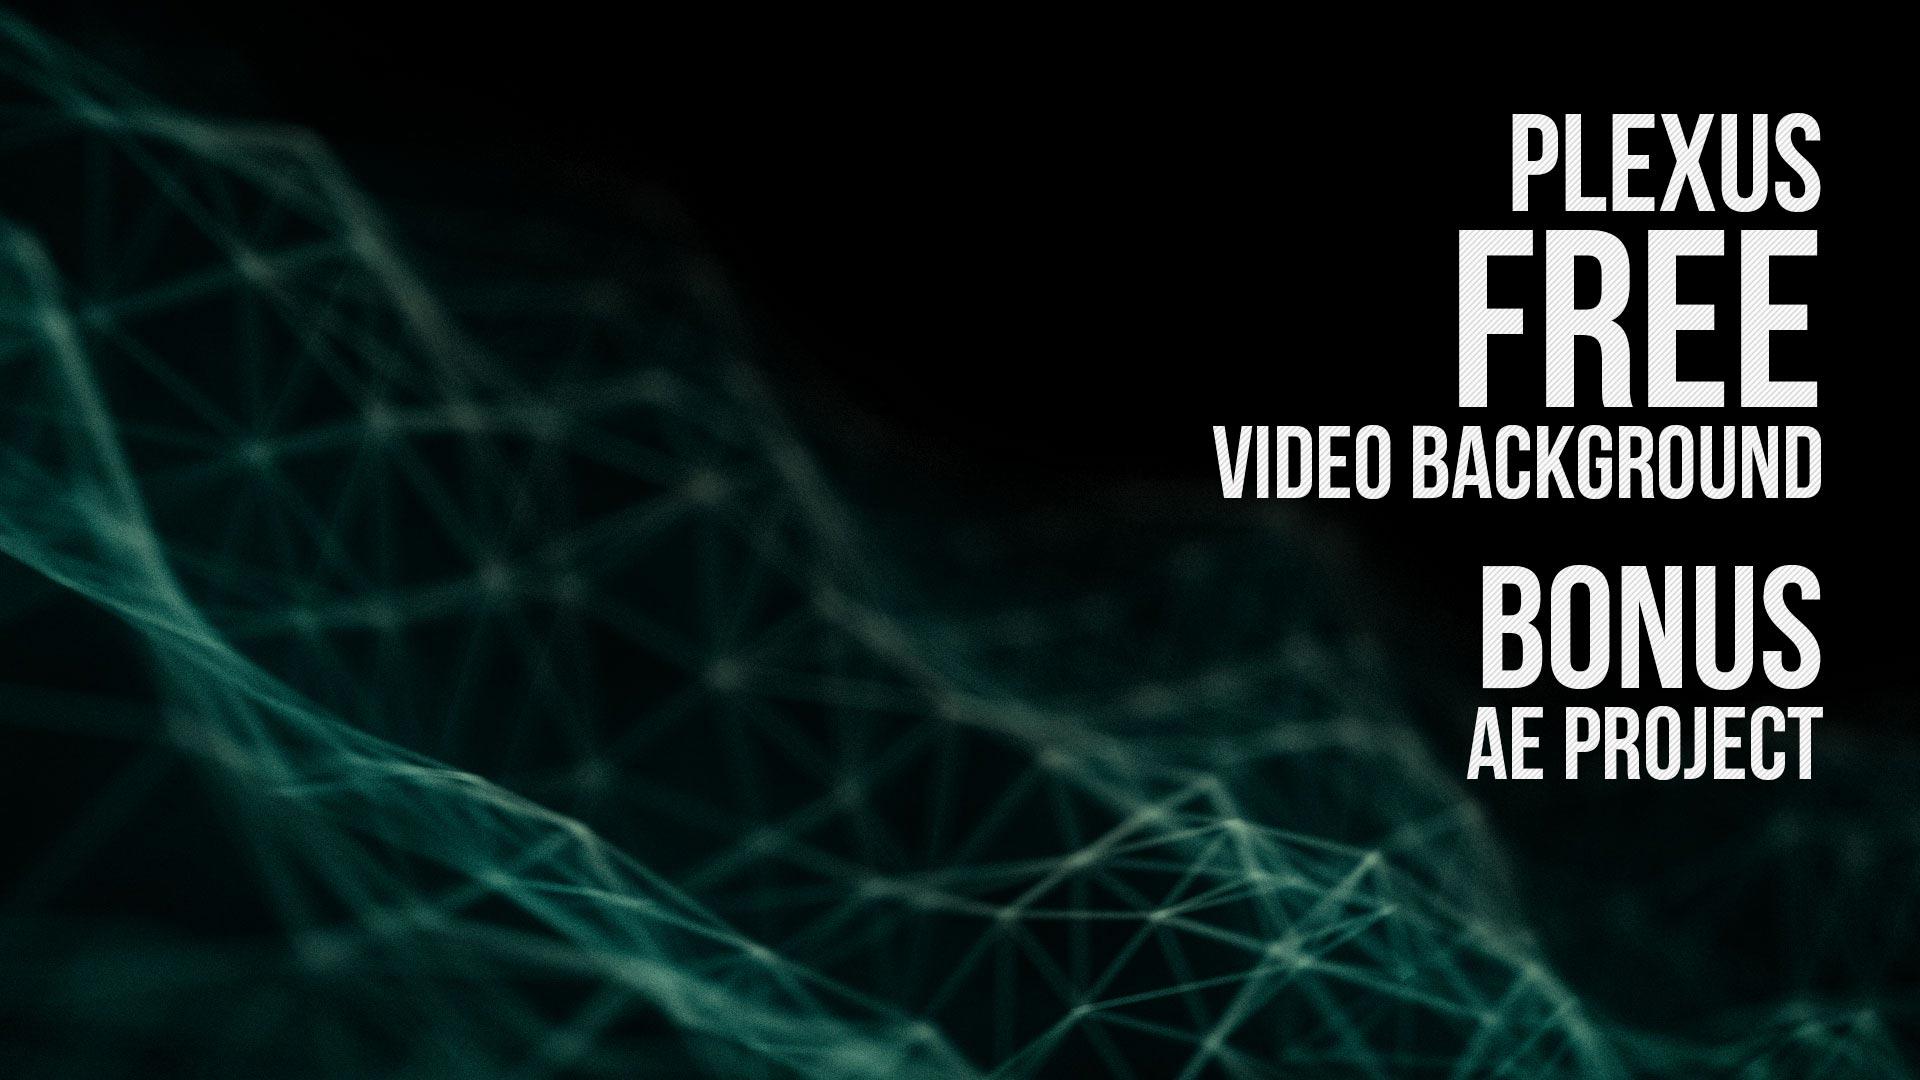 Plexus Video Background Loop Plus After Effects Template 1920x1080